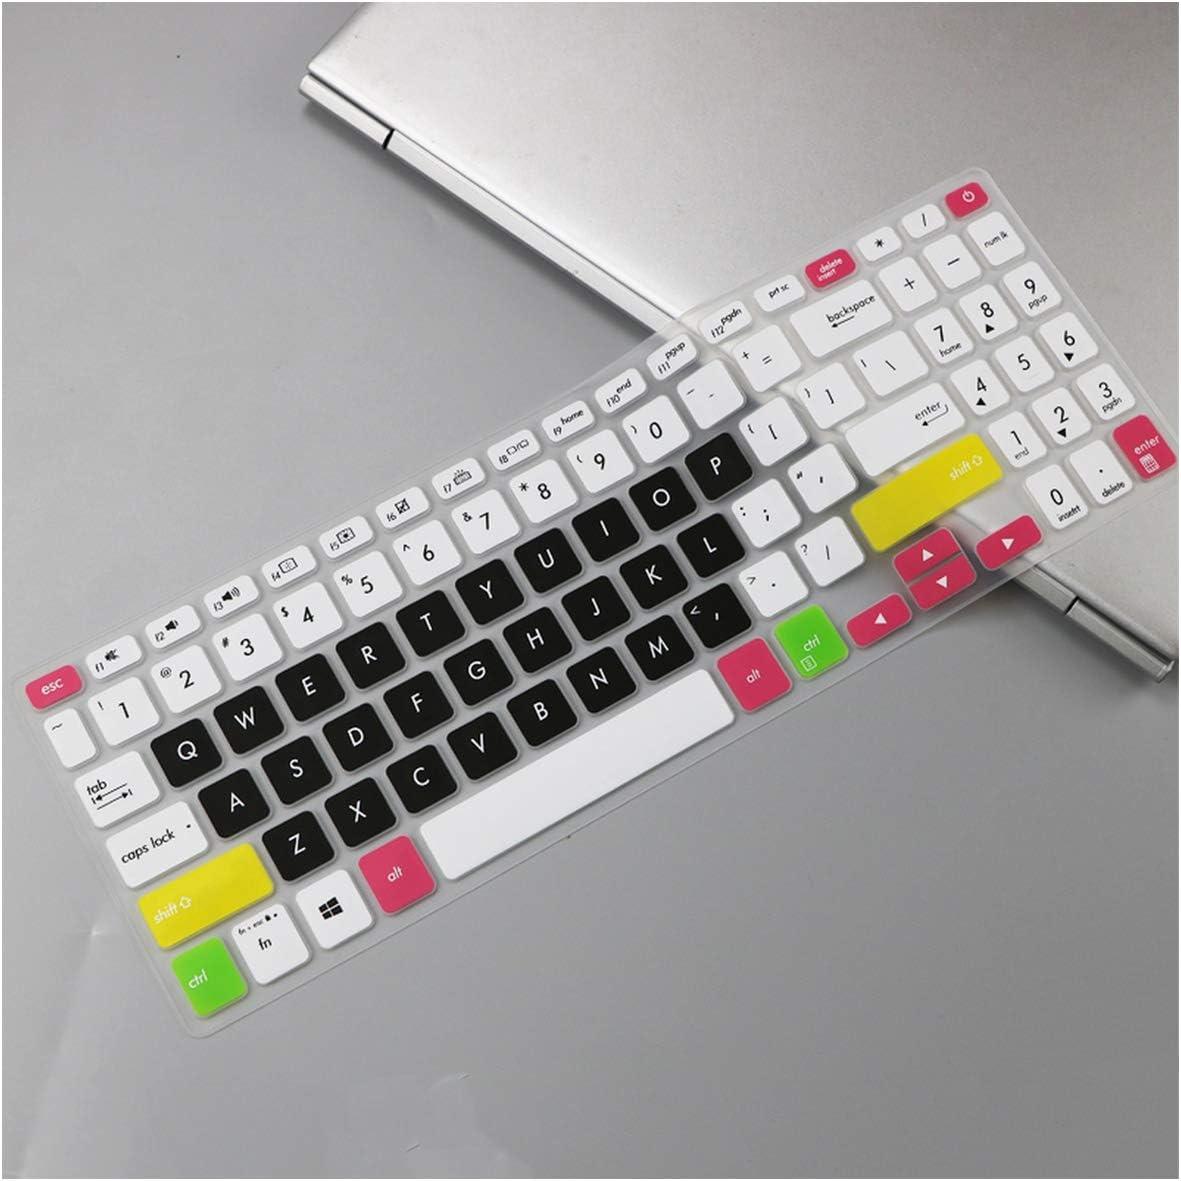 for Asus Vivobook S15 S530un S530F S530FN S530ua S530UF S530fa S530U S530 UN UA 15.6 Inch Keyboard Protector Skin Cove,whiteblue